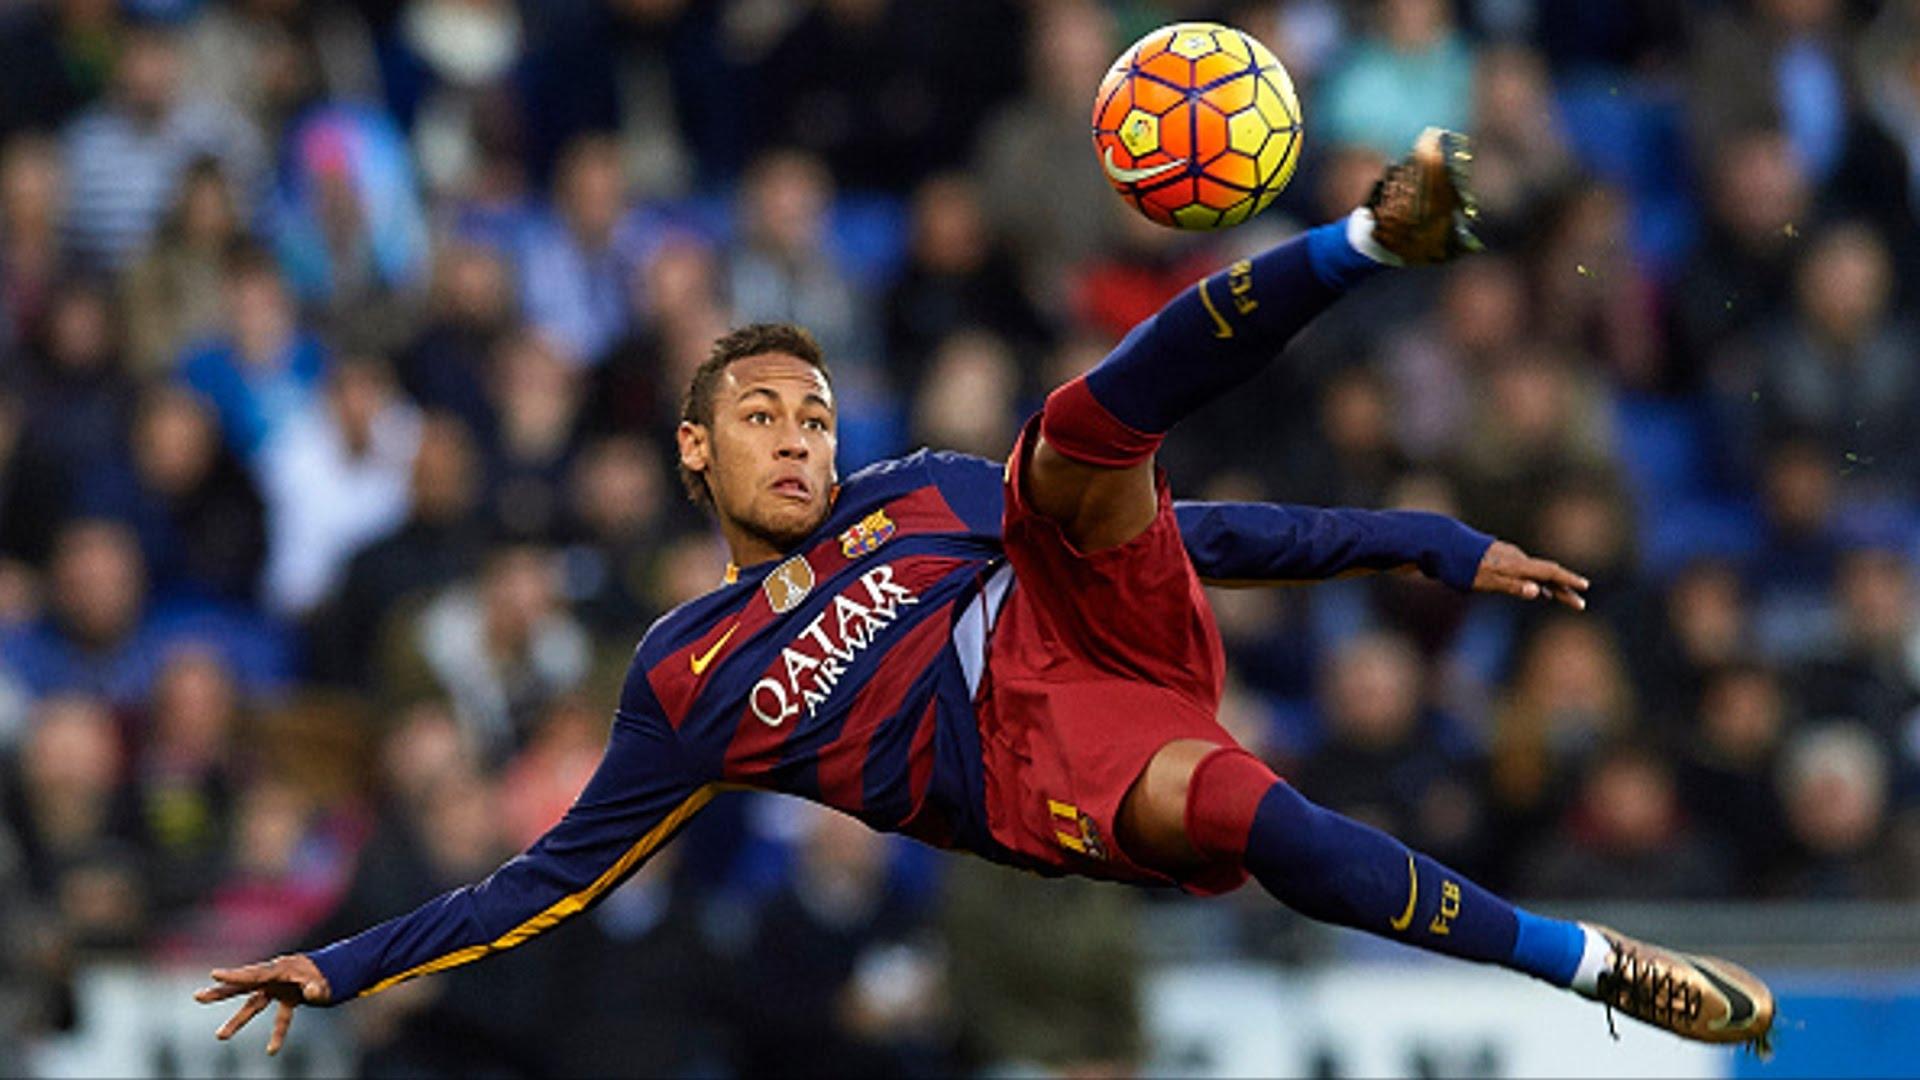 FC BARCA-PARIS: 2 buts de Neymar à la 88e et 90e (s.p) minutes